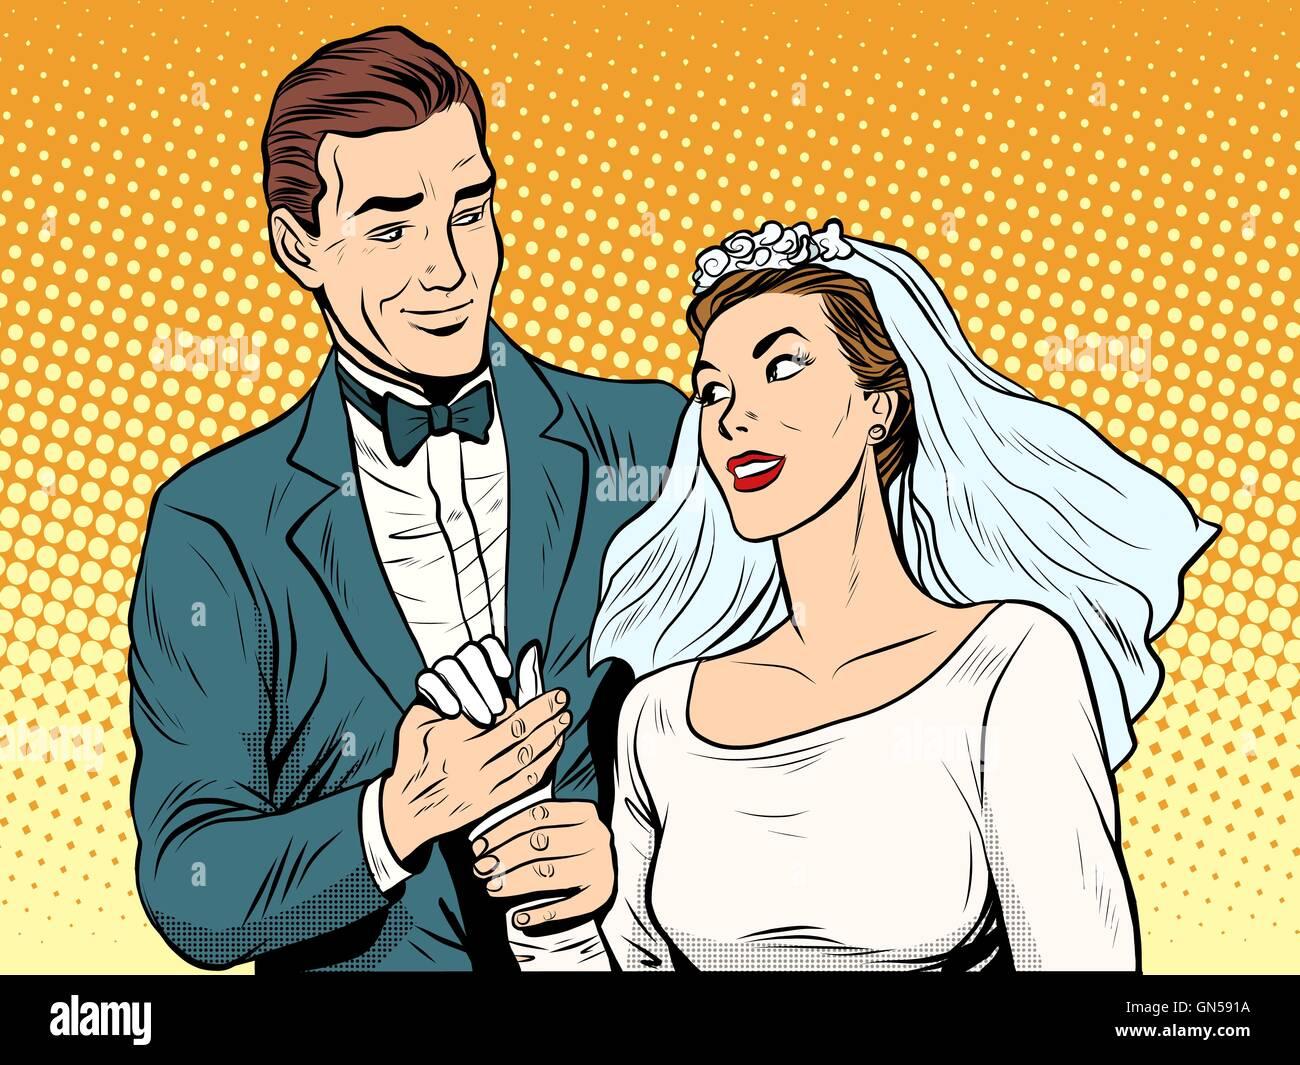 Wedding betrothal engagement groom bride love - Stock Image